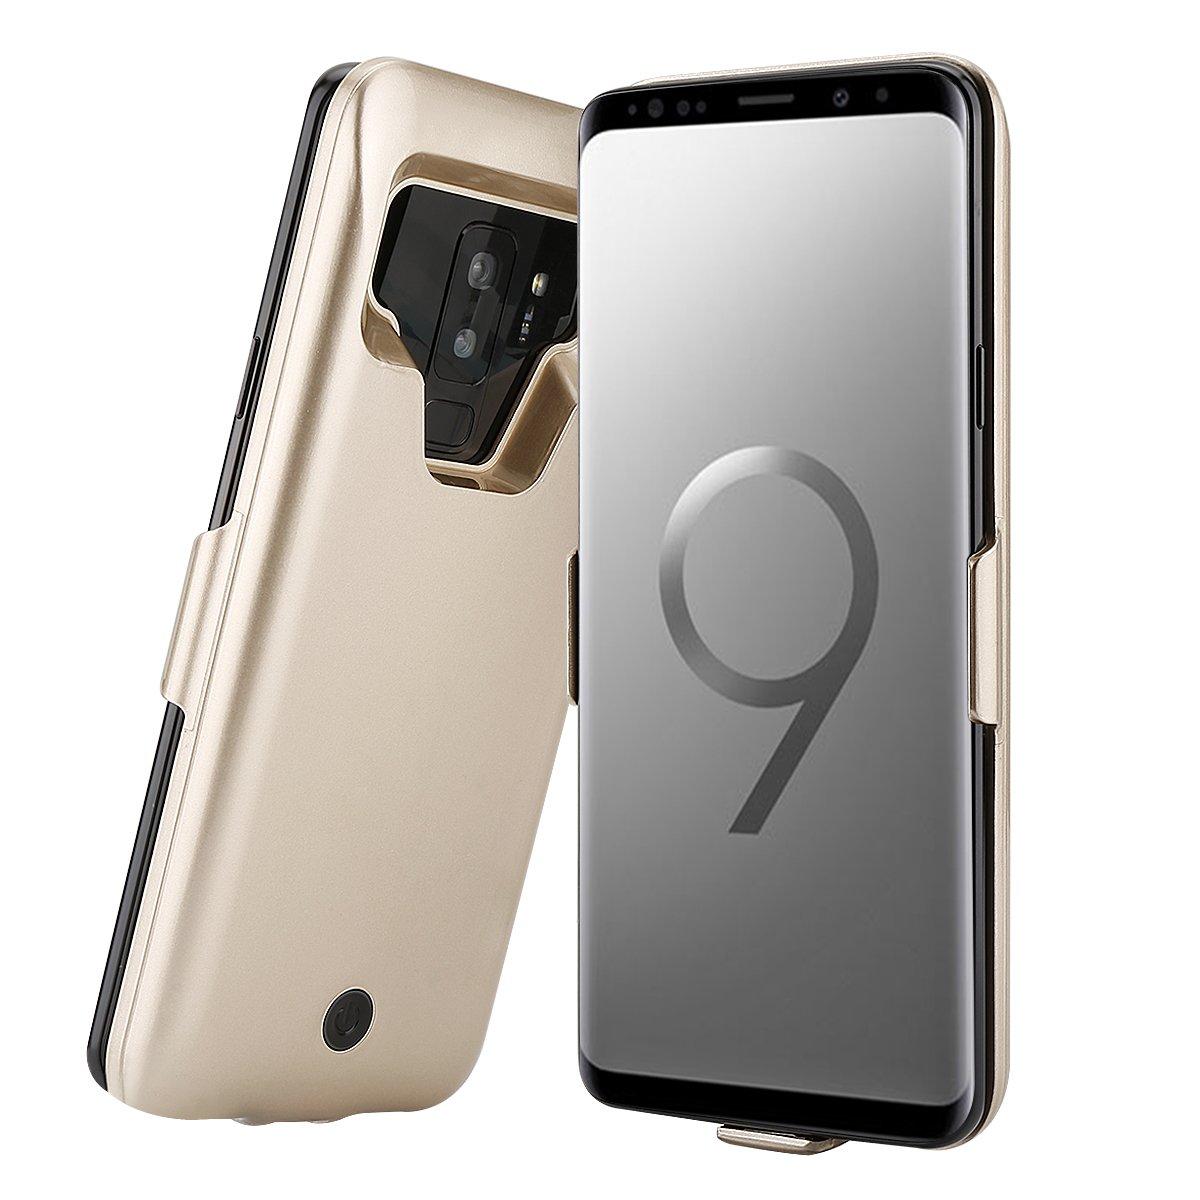 best sneakers 41caa da0a0 Amazon.com: Samsung Galaxy A8 Plus 2018 6000mAh Battery Case ...